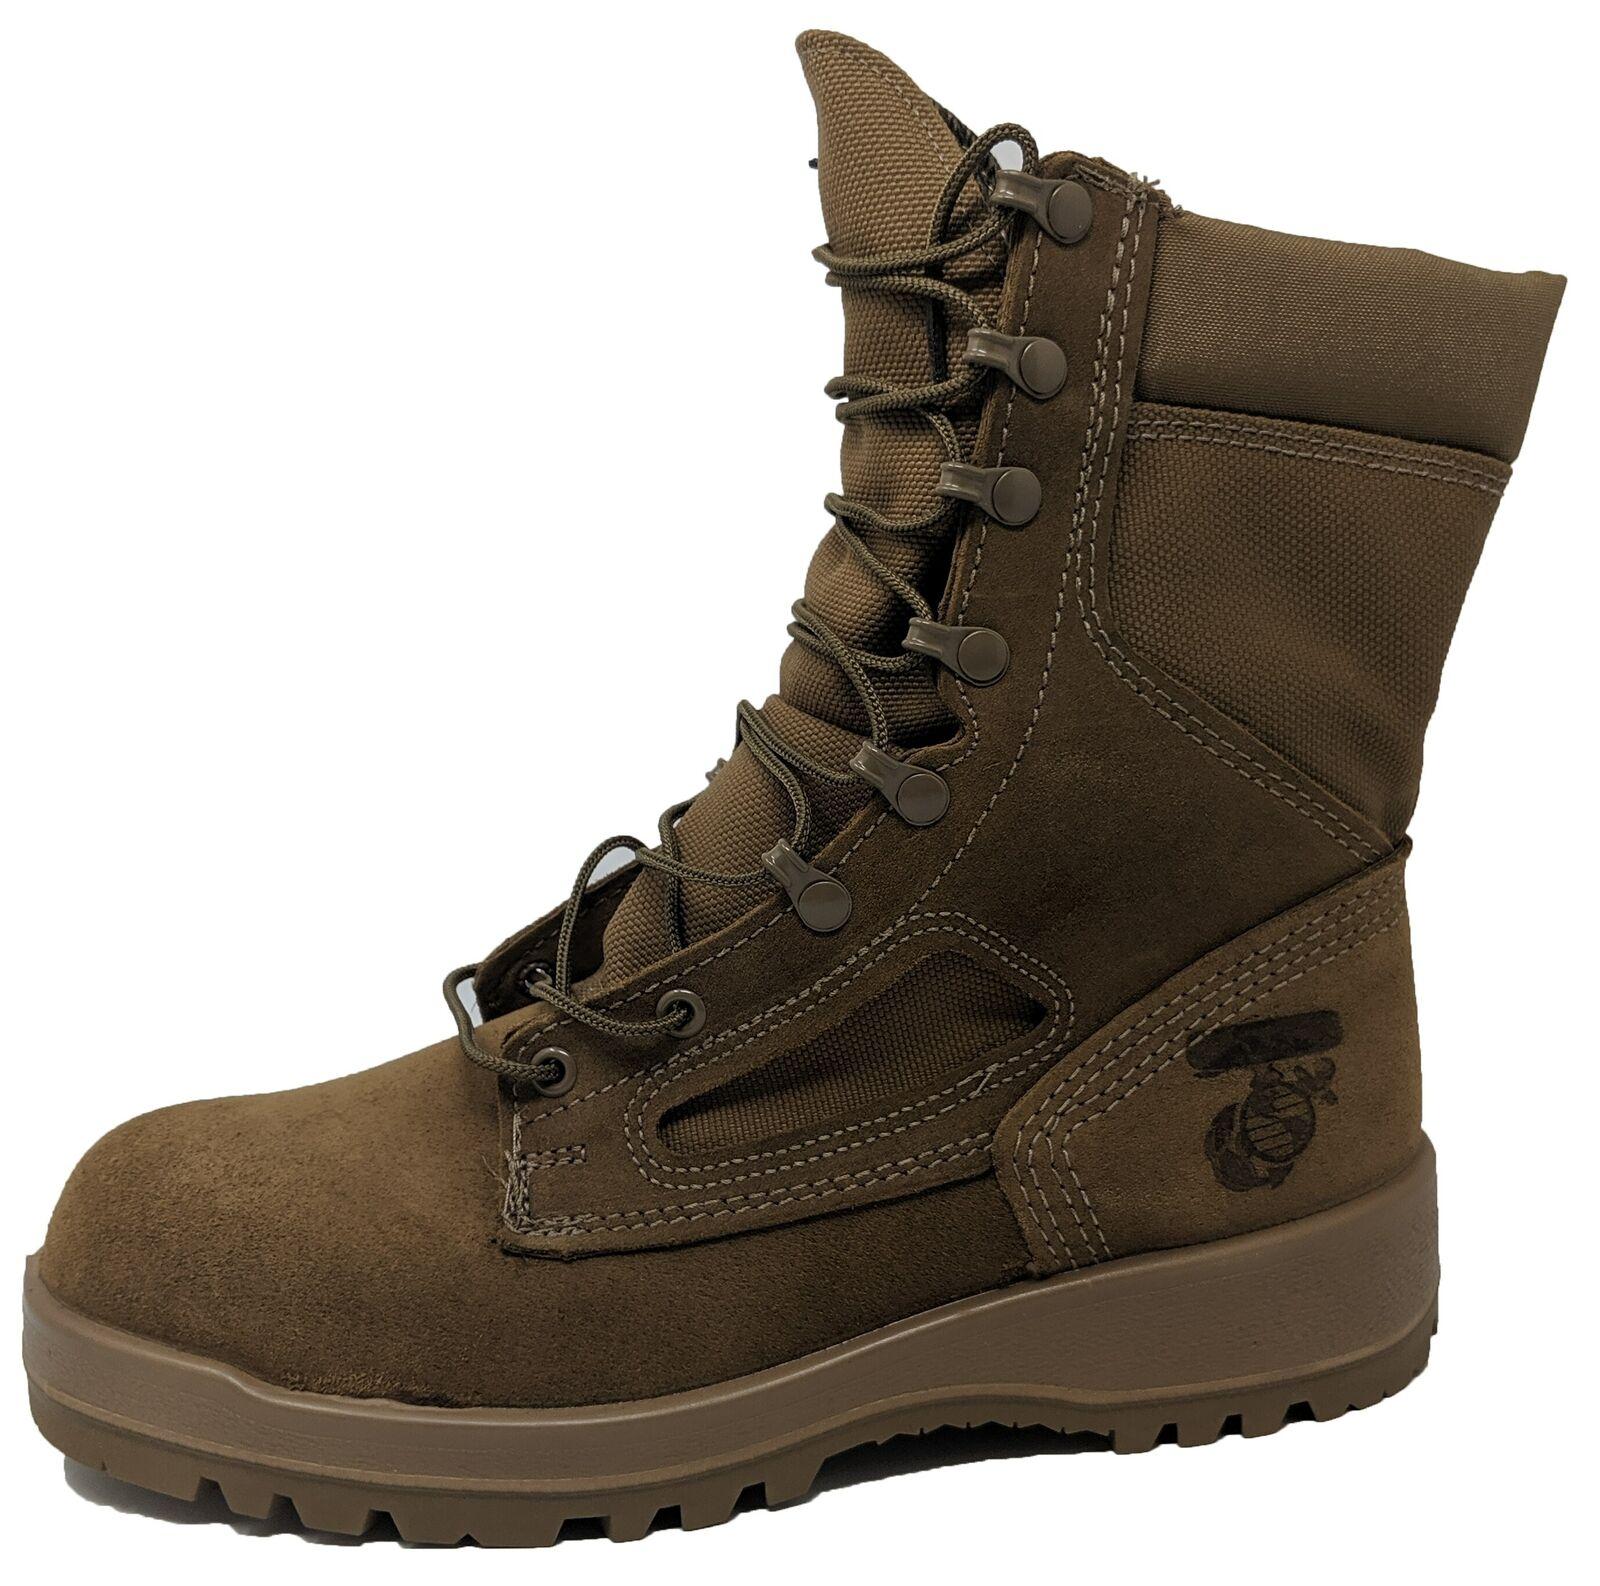 Bates 85506NL-B Mens NON-USMC GORE-TEX